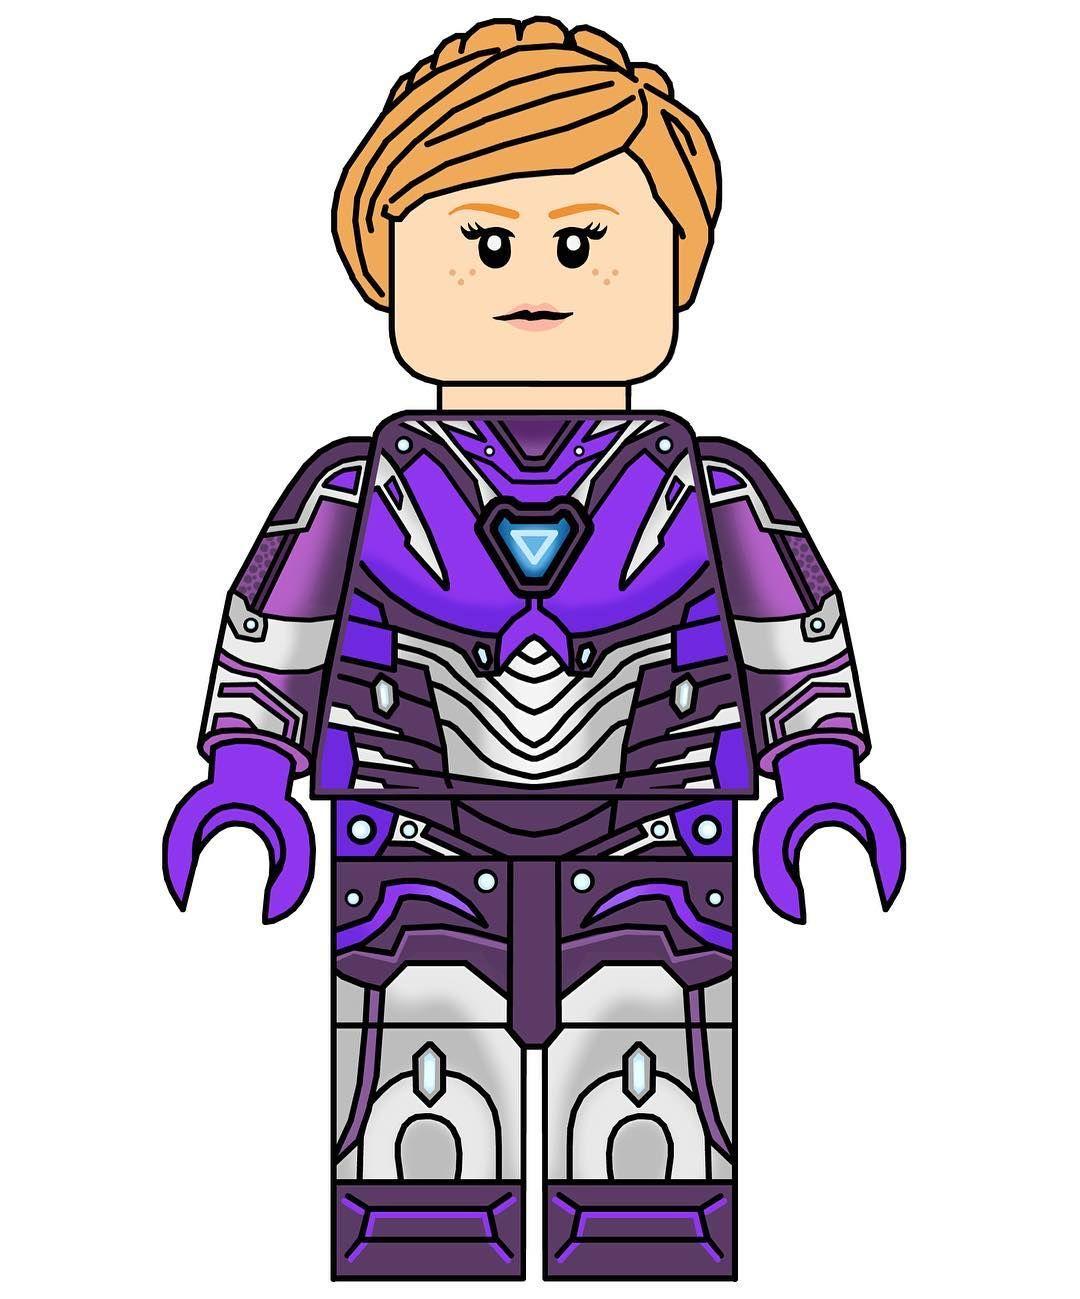 Custom Lego Rescue Armor Minifigure From Avengers 4 Hope You Guys Like It Lego Legoavengers4 Legoaven Lego Iron Man Lego Custom Minifigures Mini Figures